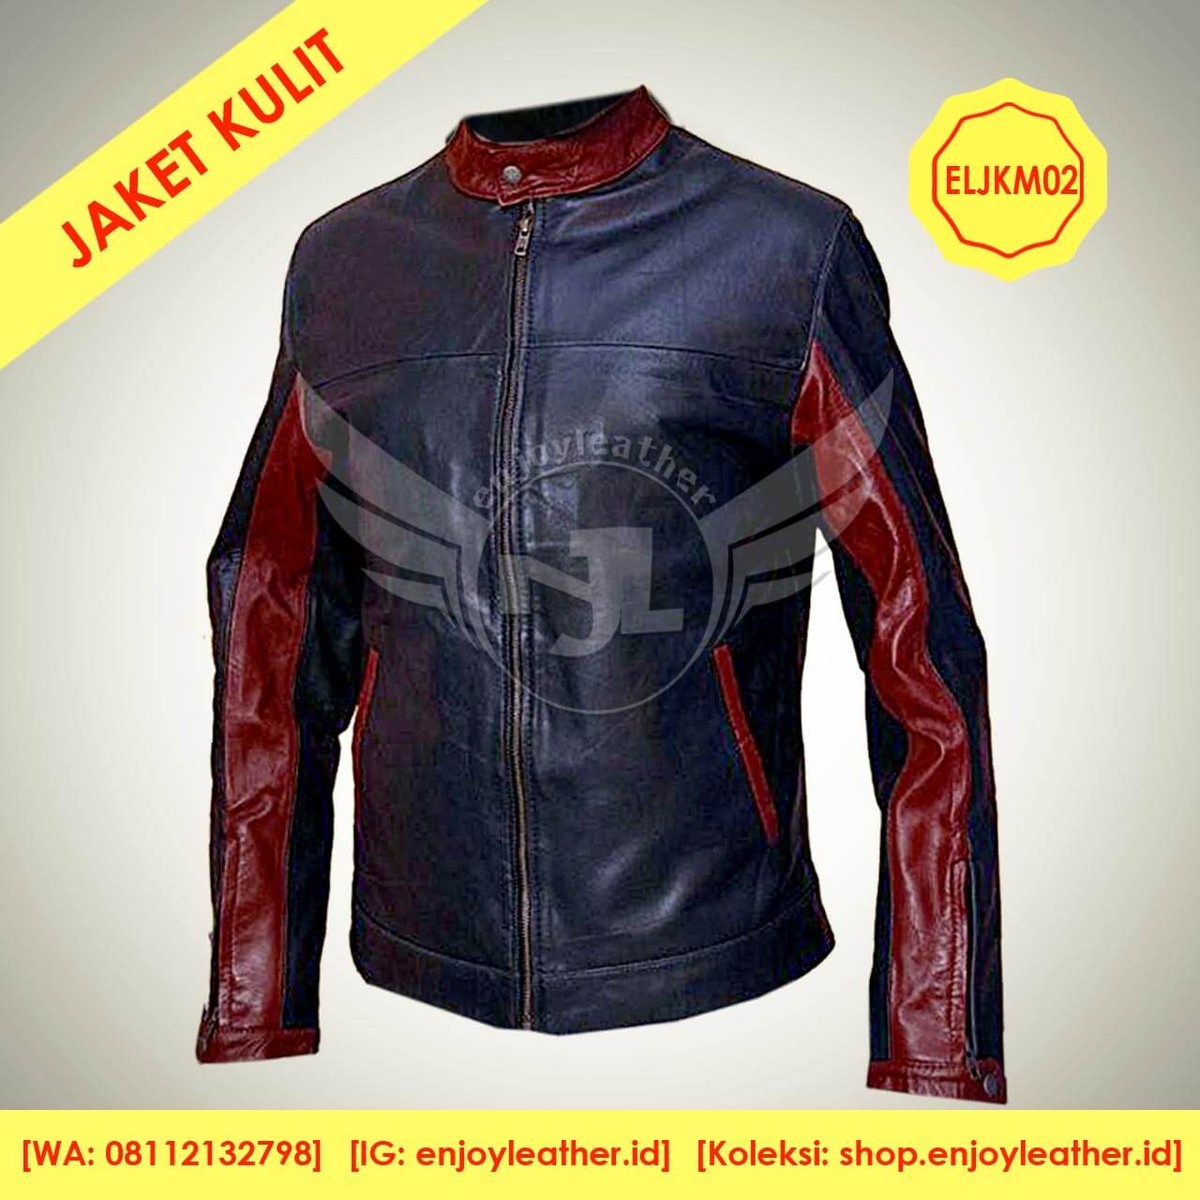 Team Blue01  Team Blue01. Jual jaket kulit ... d036390d17